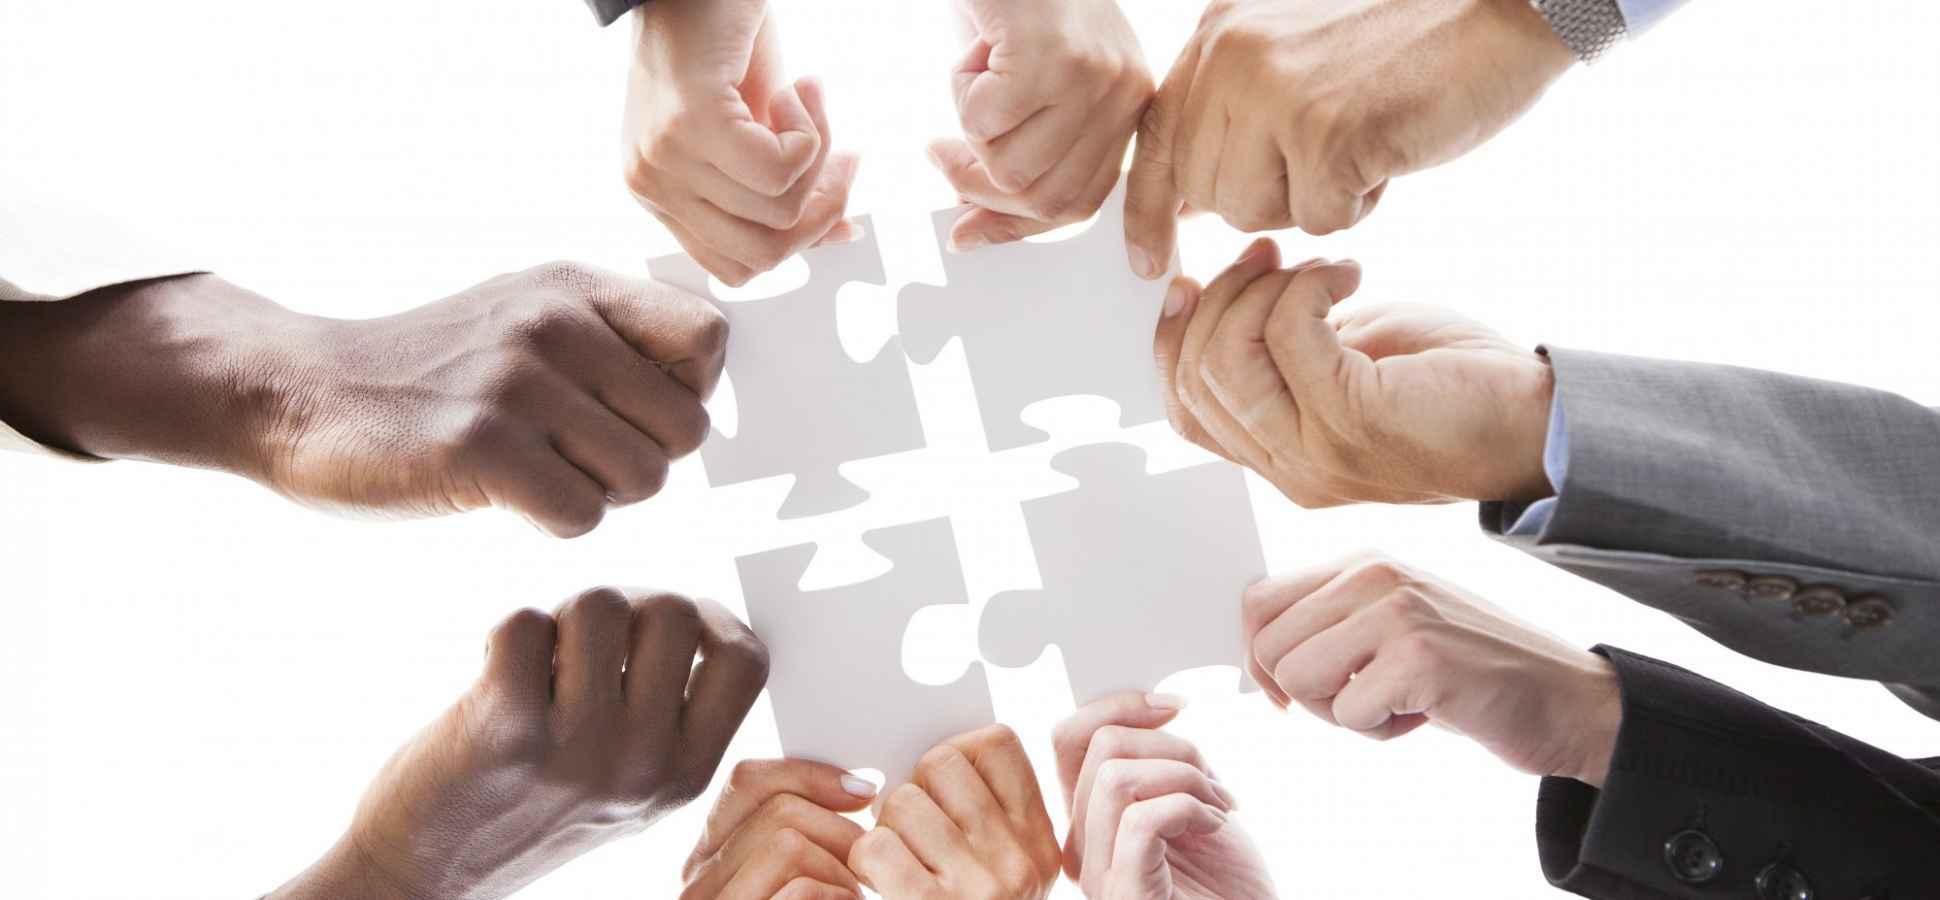 How To Build A Brilliantly Creative Team